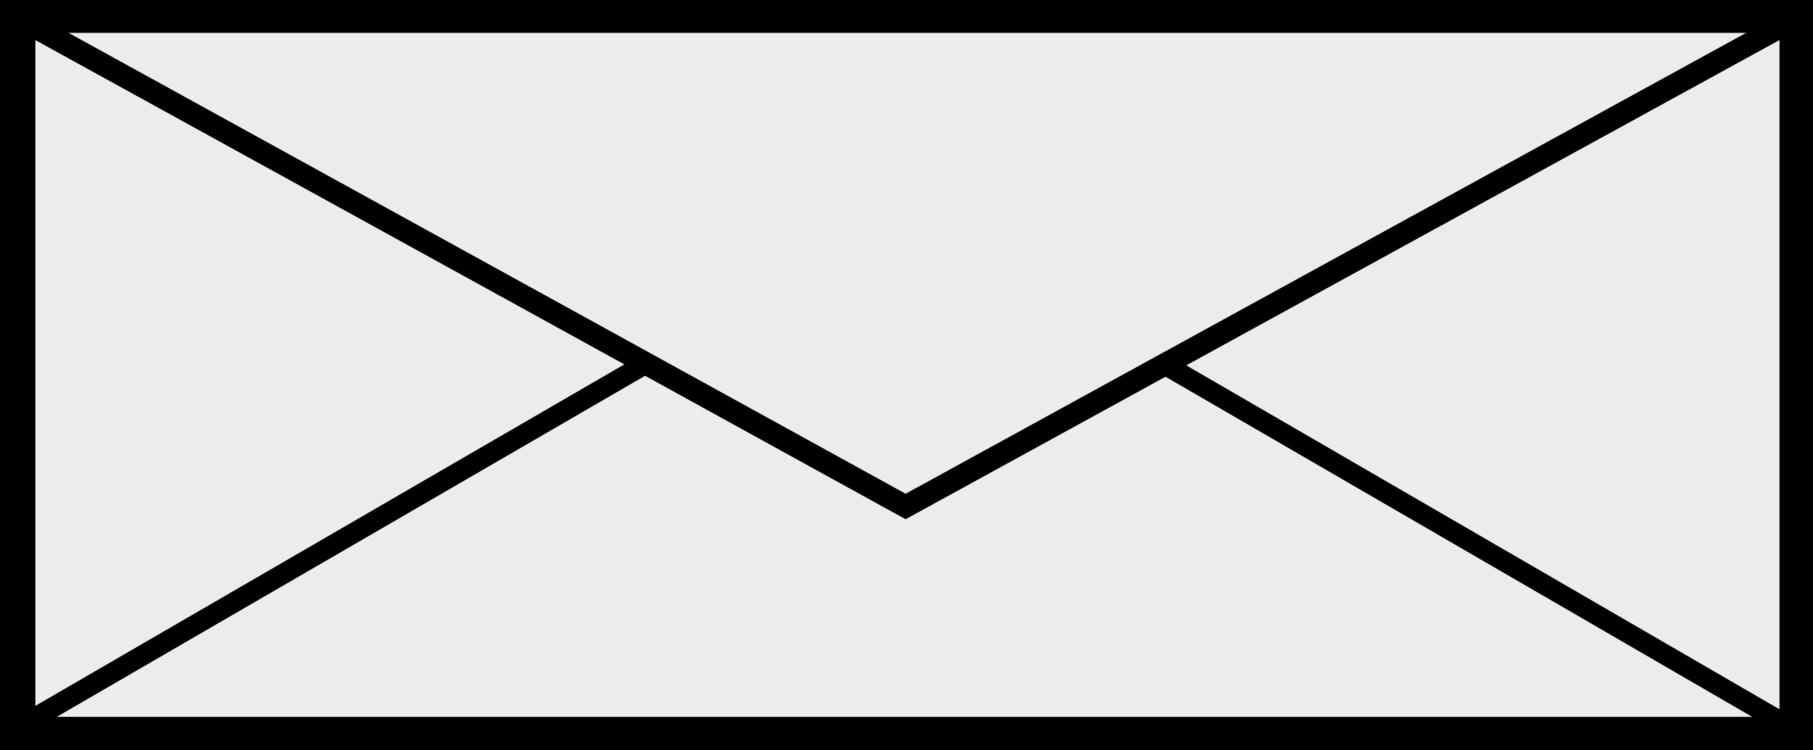 Line Art,Triangle,Symmetry Vector Clipart.